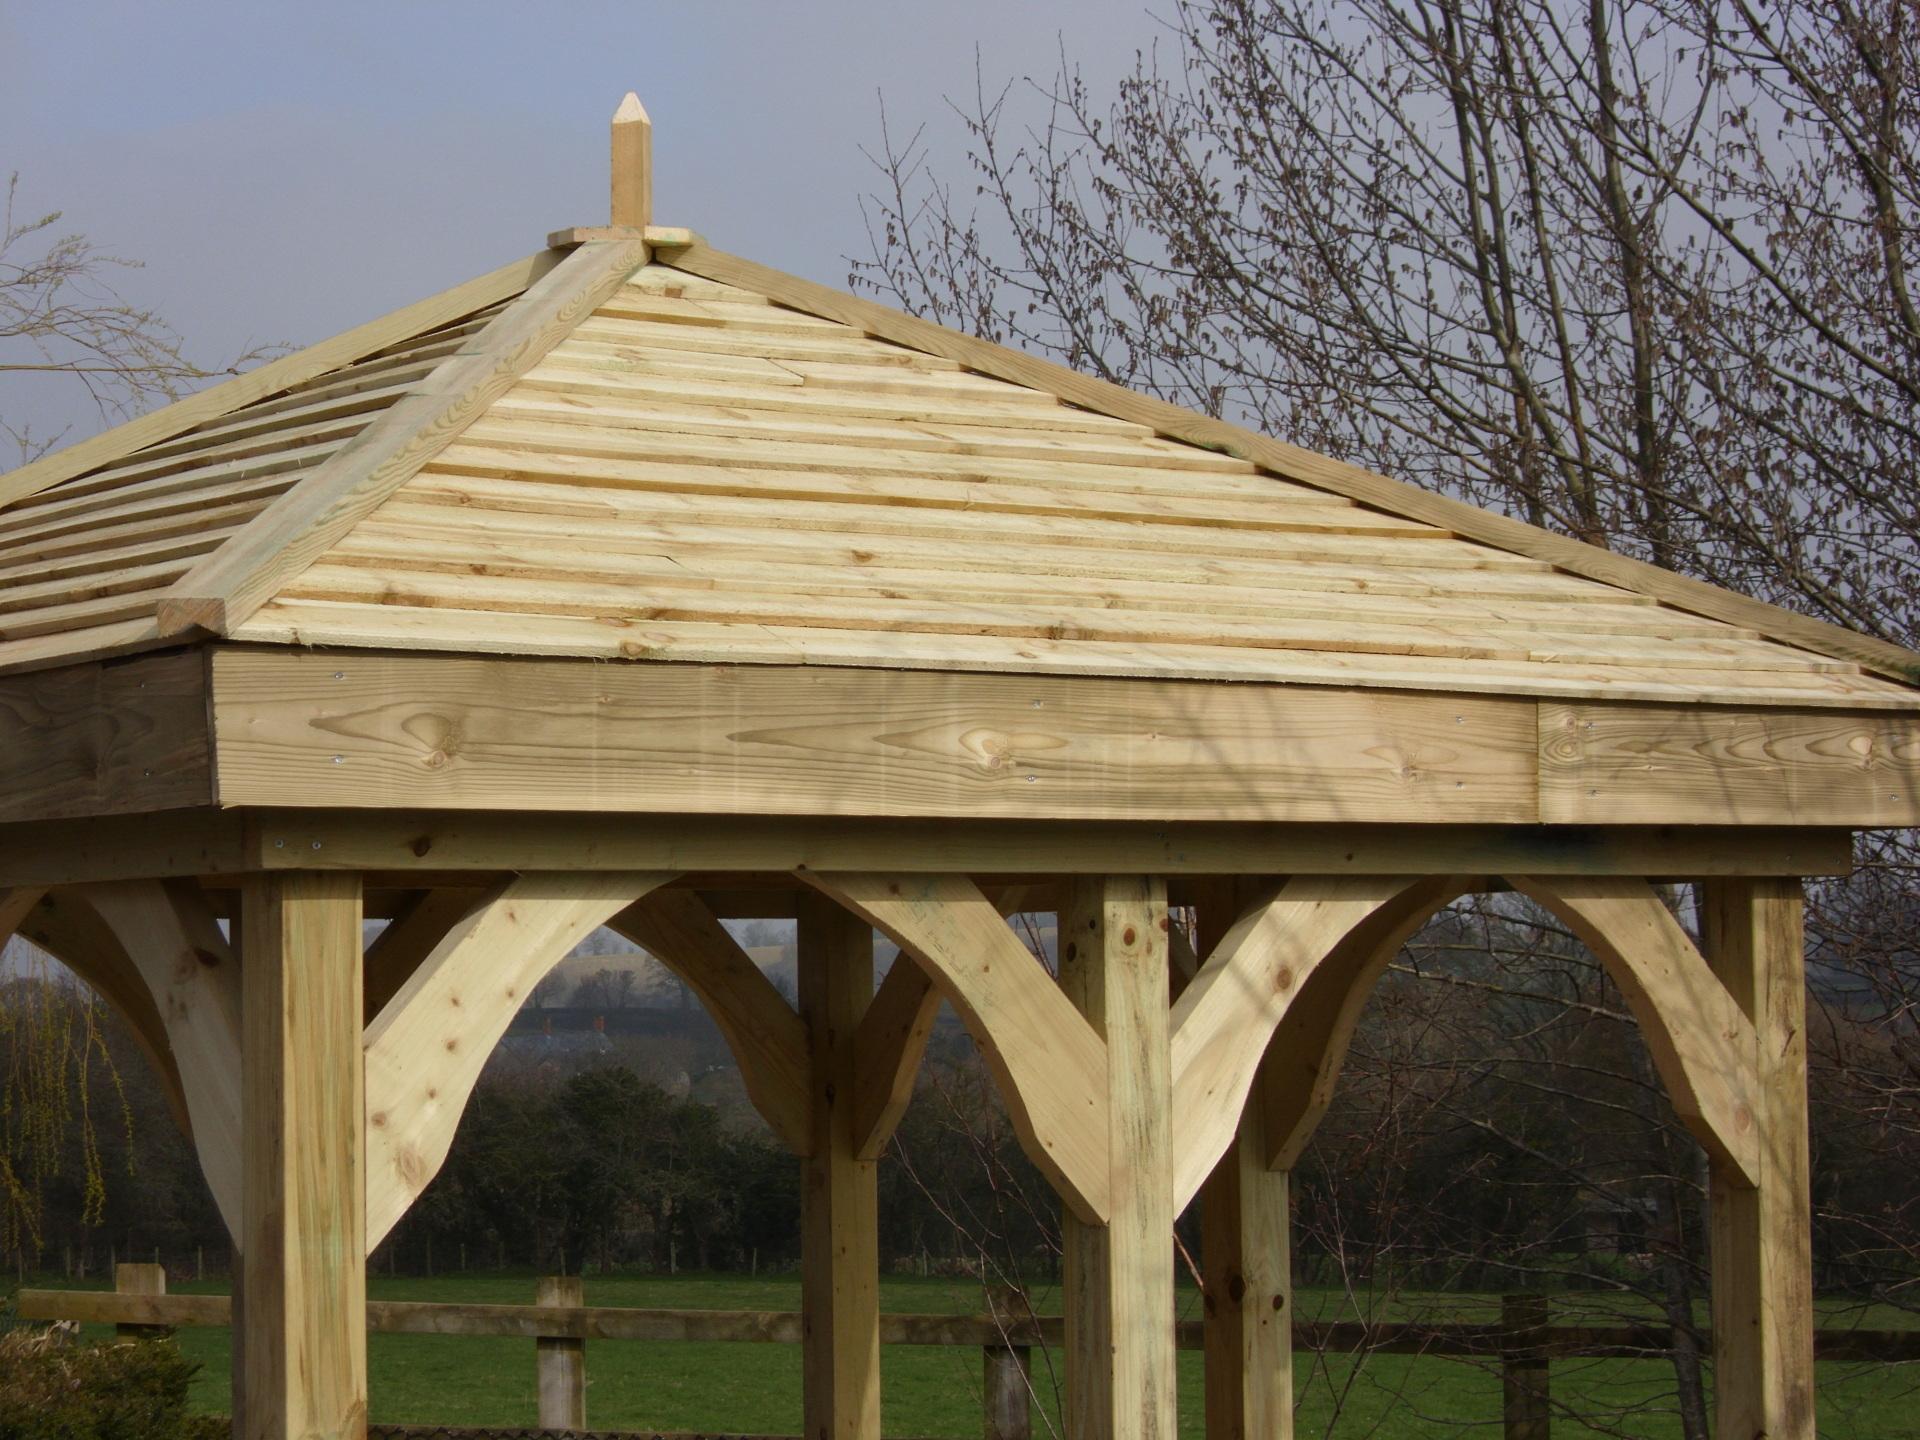 Shingle style roof